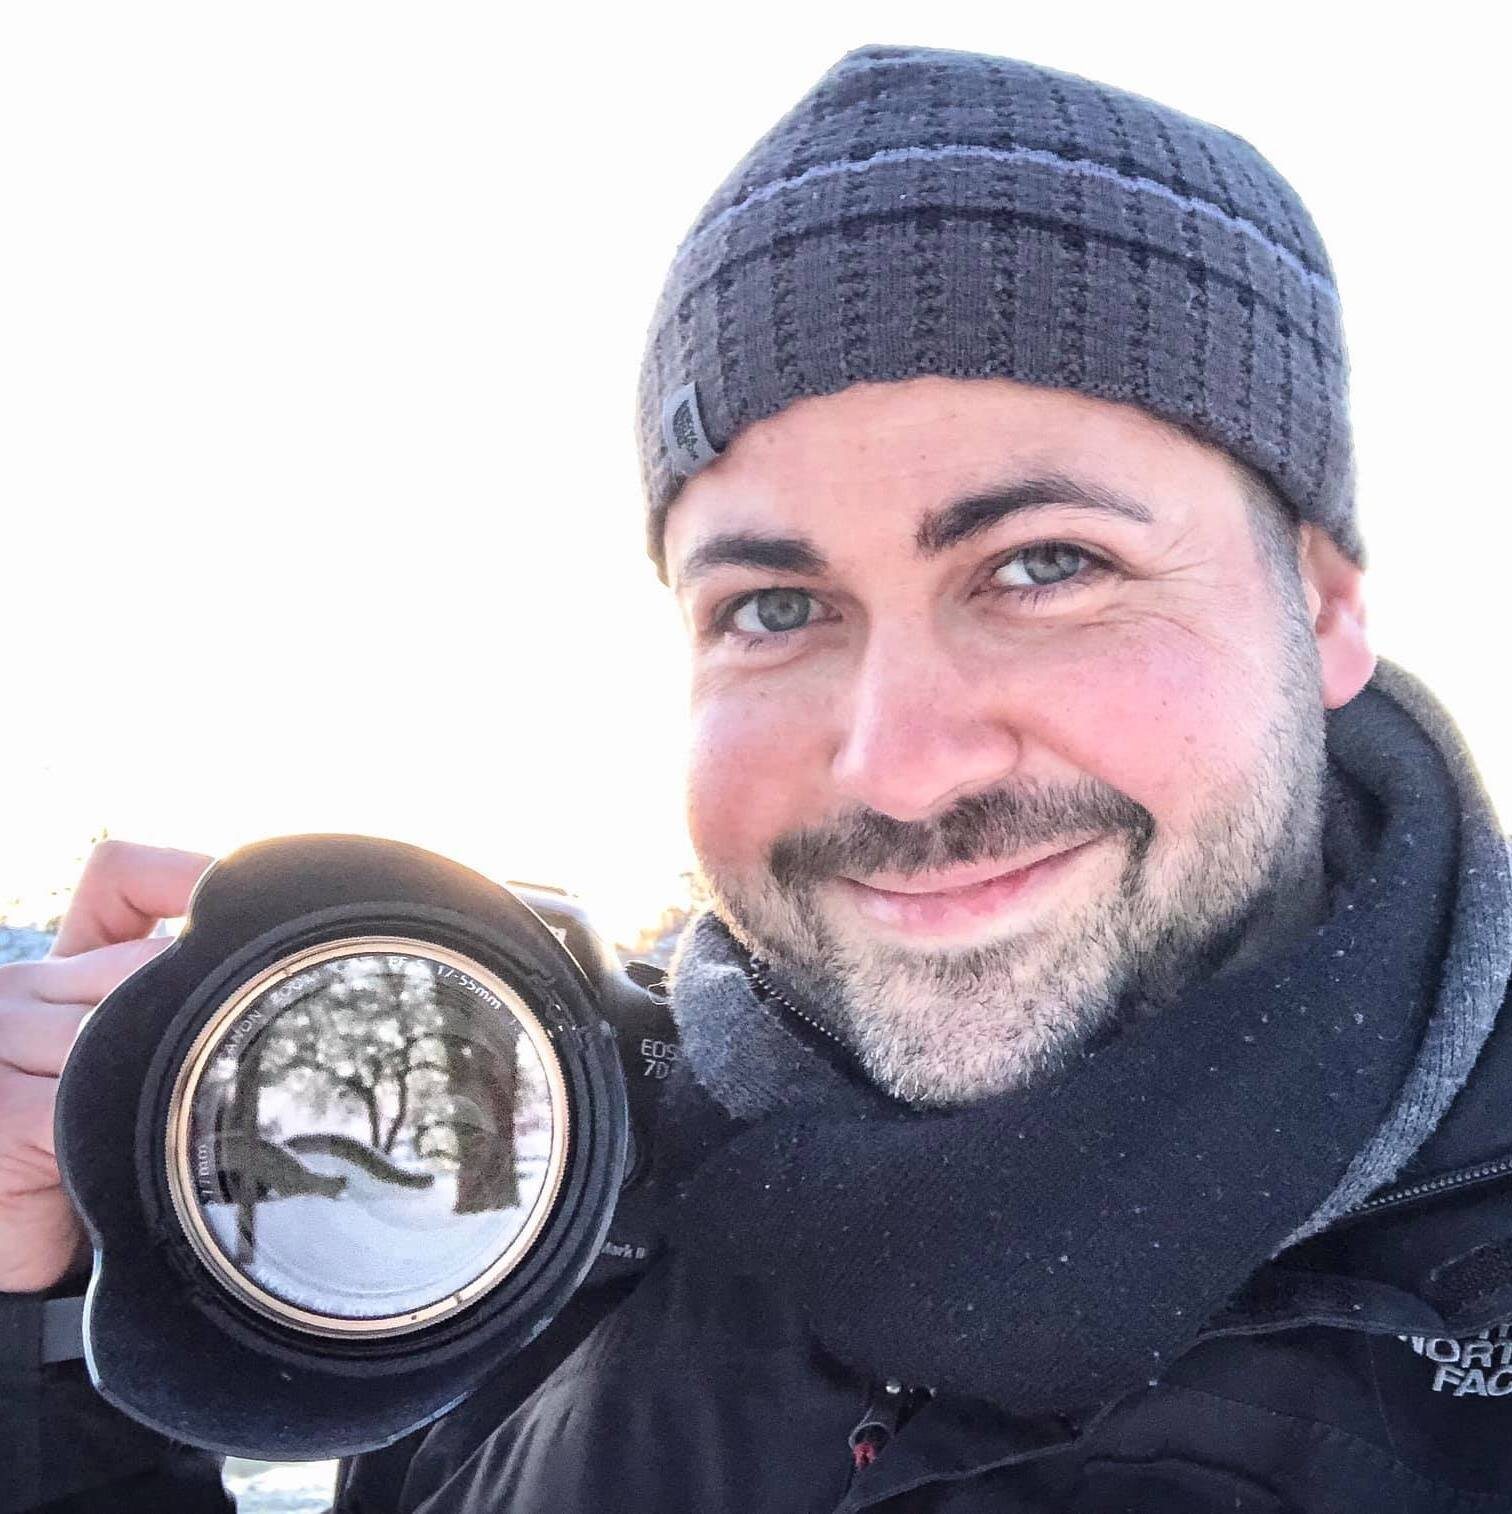 Adam-Shea-Photographer-Neenah-Green-Bay-Appleton-Wisconsin-Portait00008.jpg